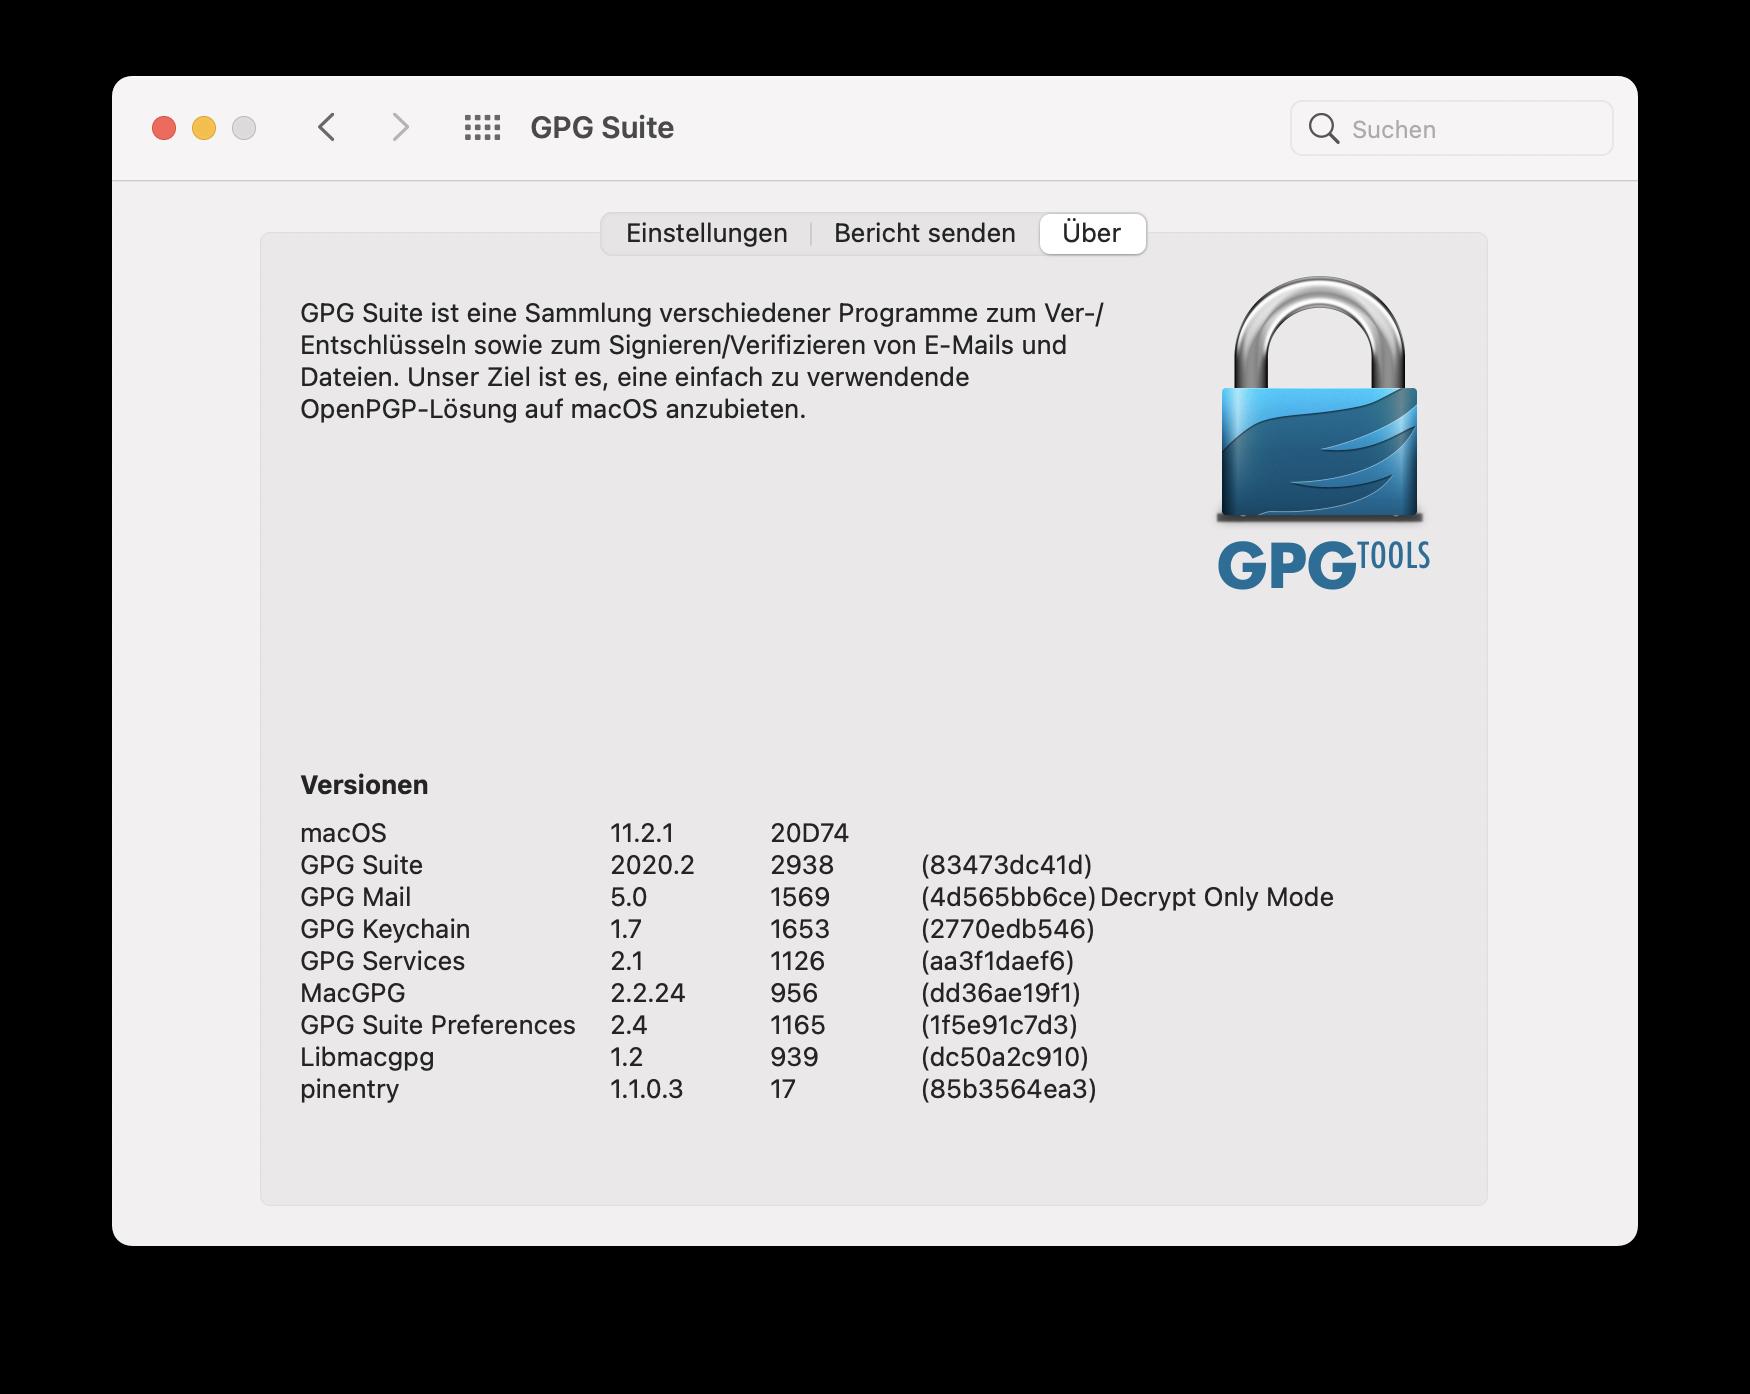 Gpgtools-versions